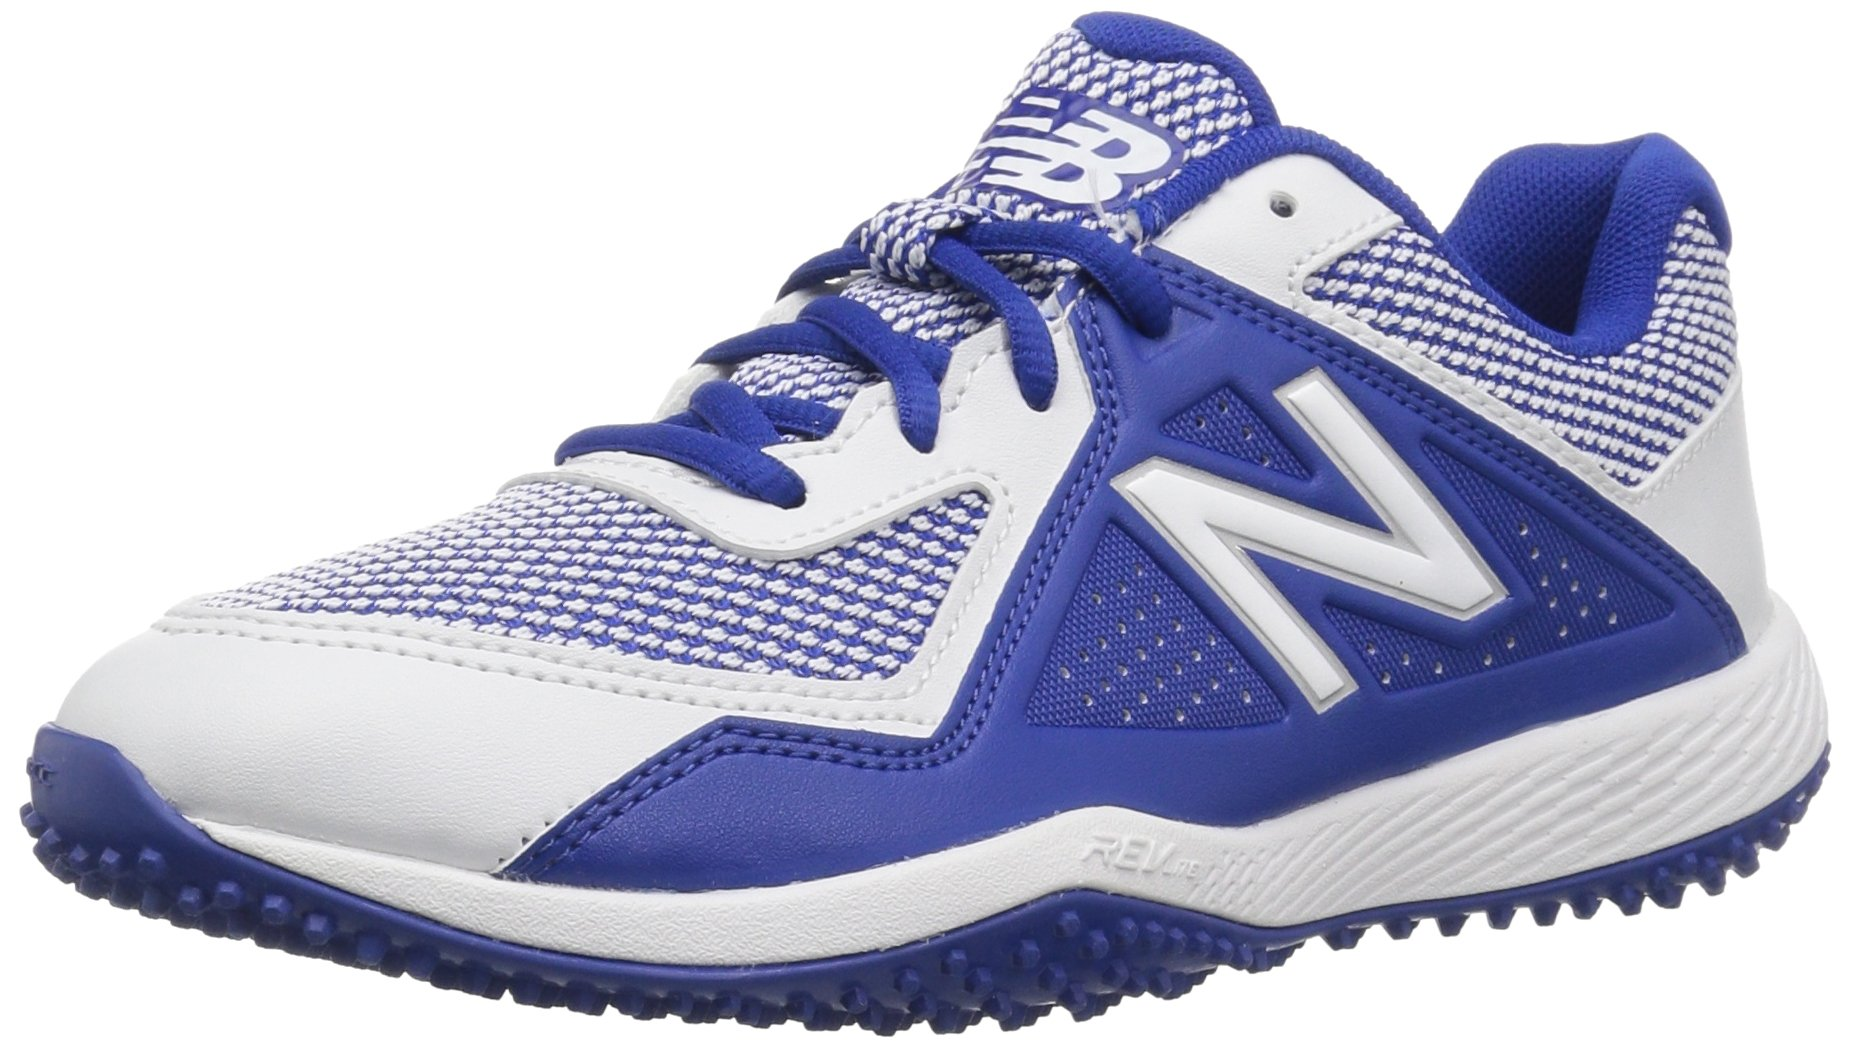 New Balance Boys' TY4040 Turf Baseball Shoe, Royal/White, 2.5 M US Little Kid